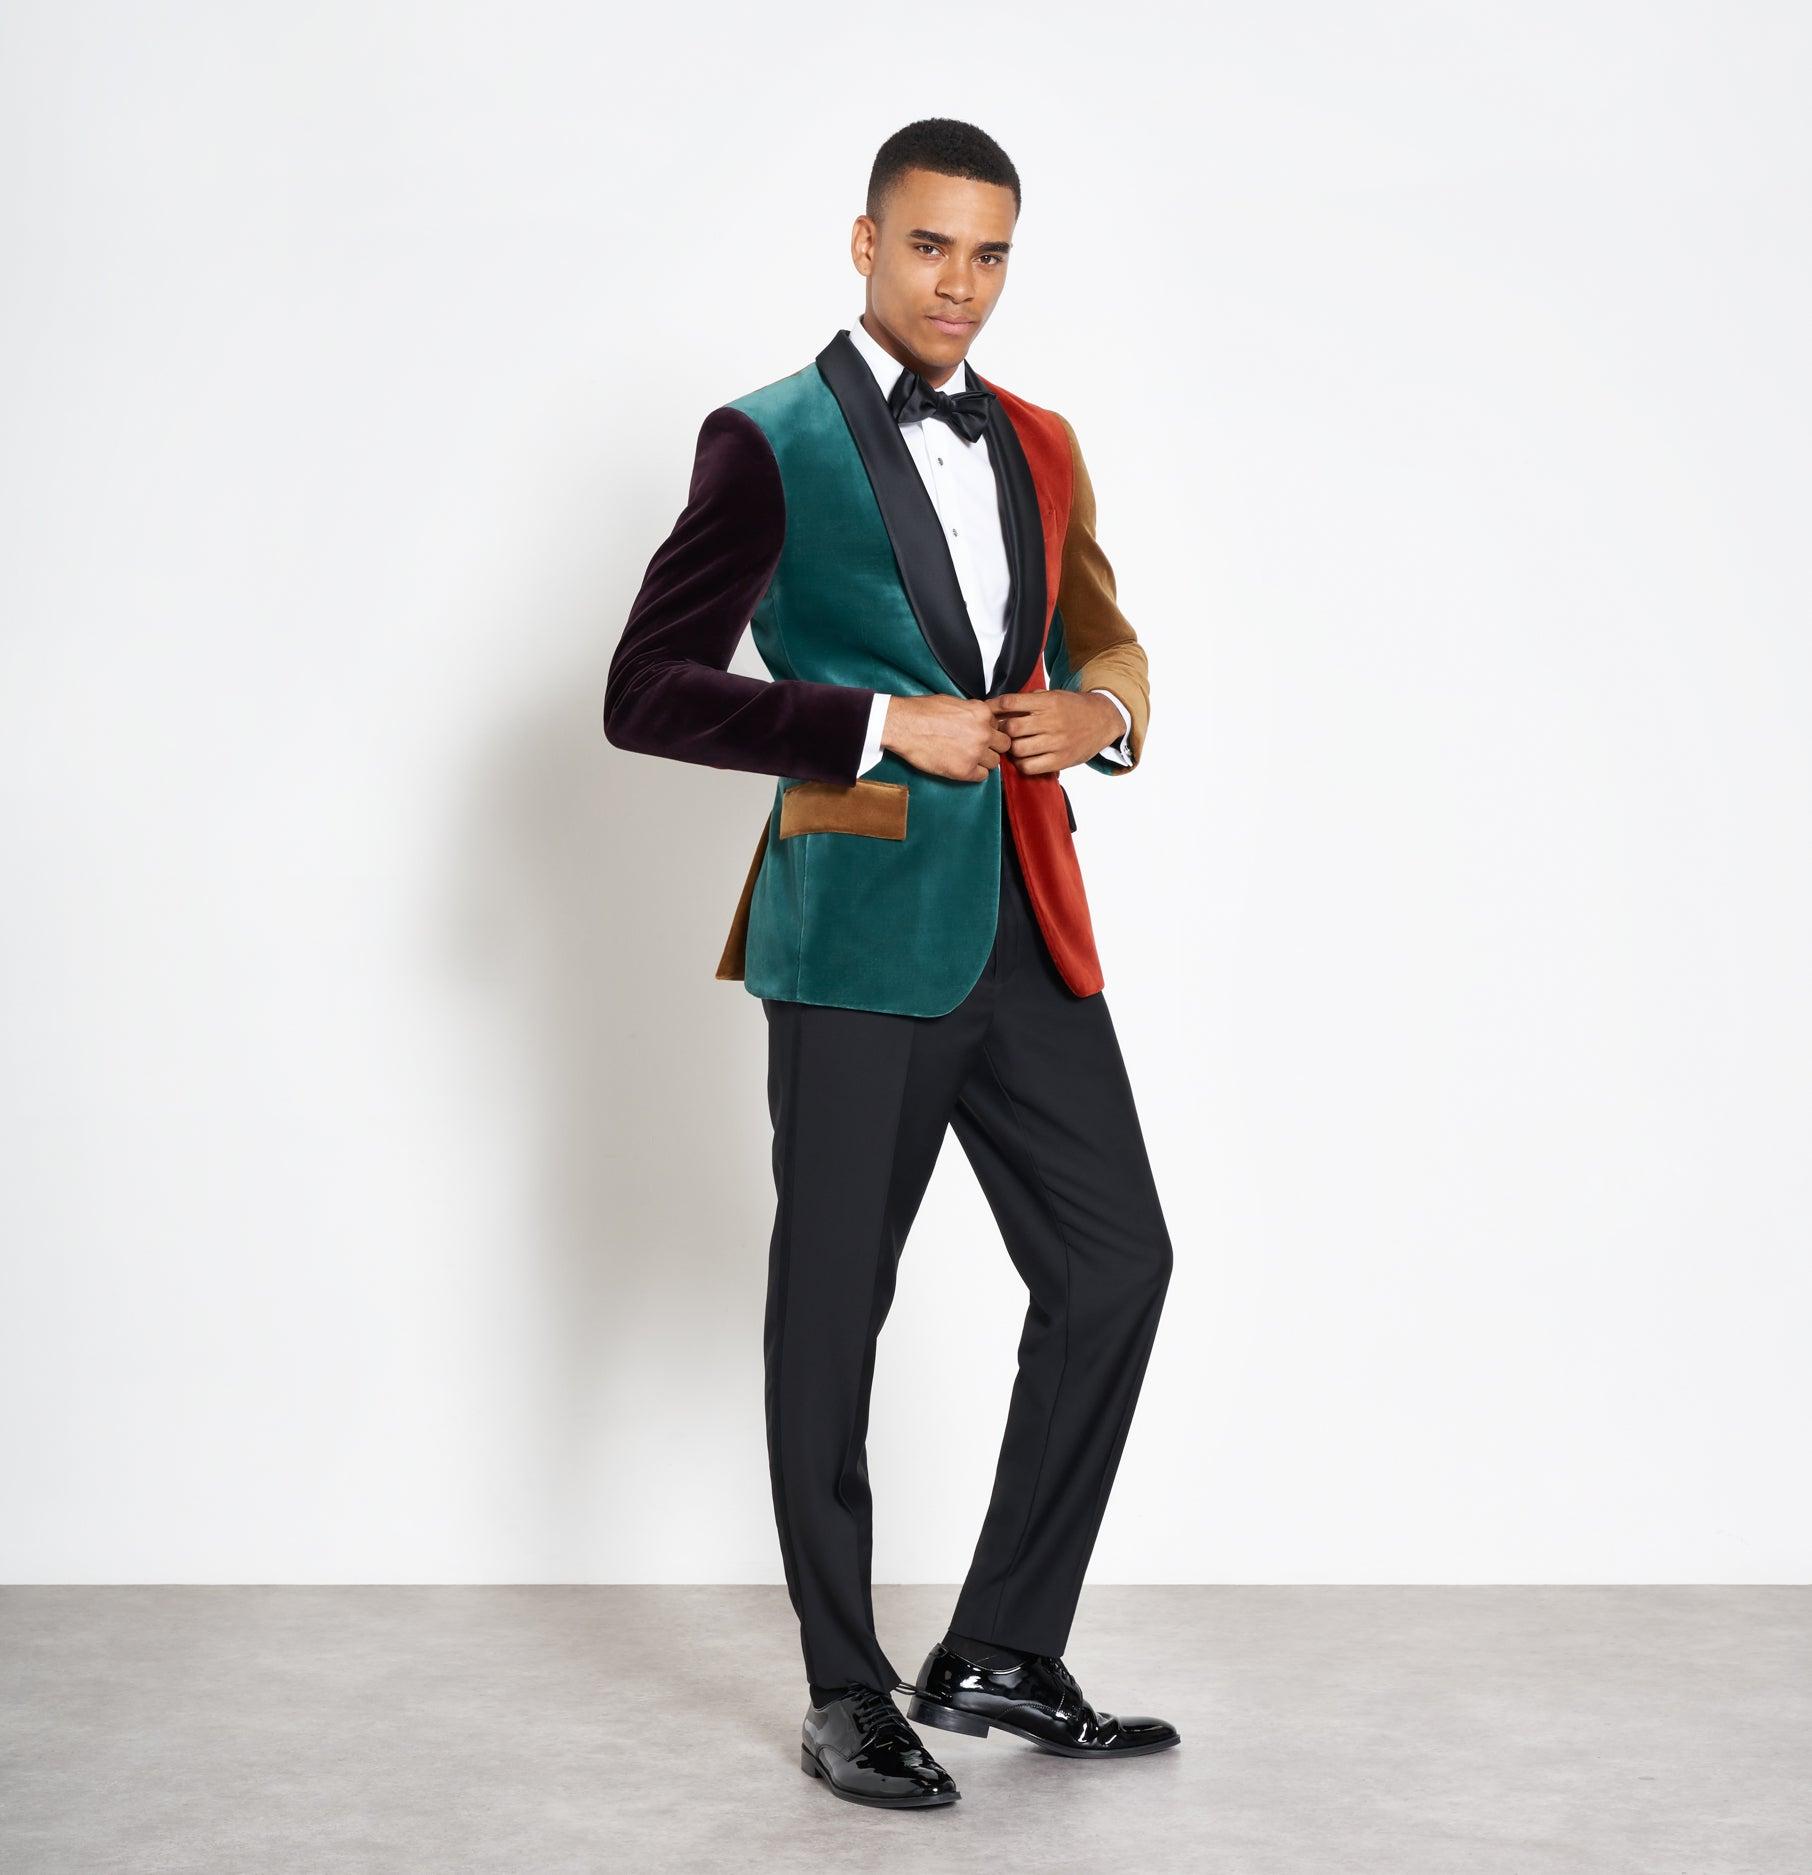 0de464fe6195 Color Blocked Velvet Jacket Tuxedo | The Black Tux